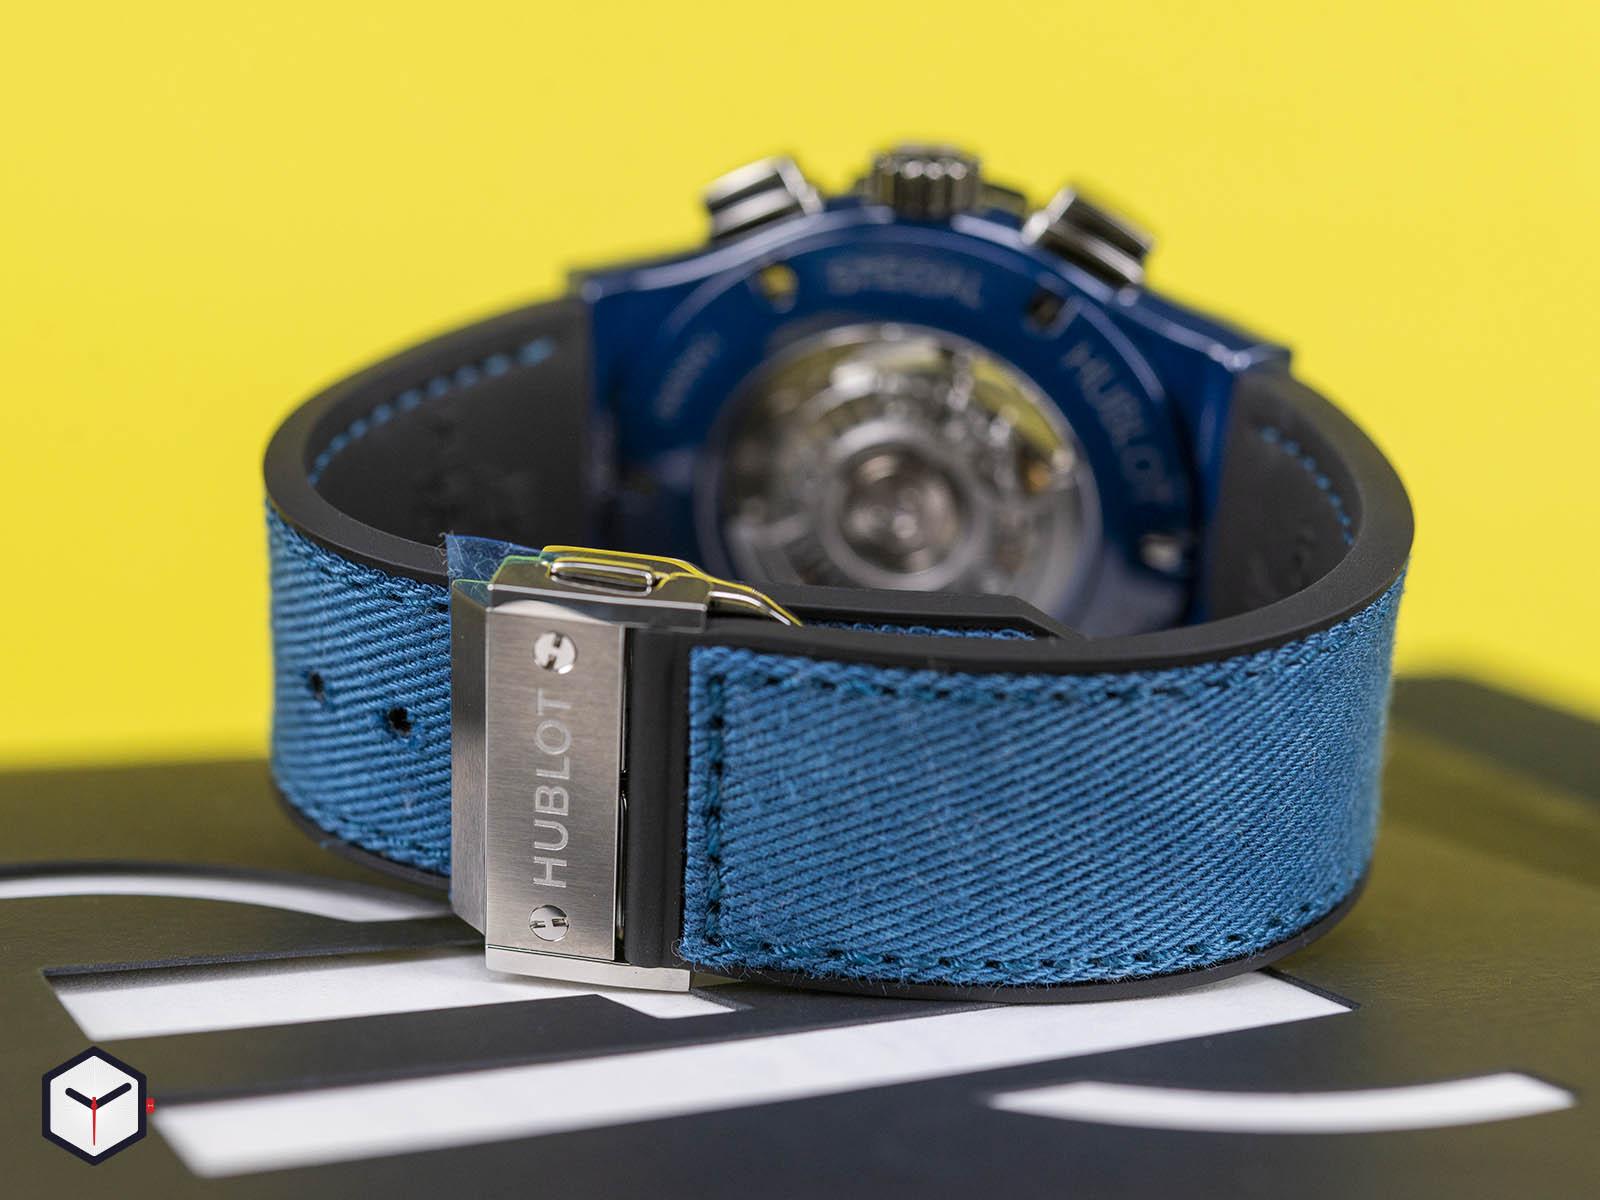 525-ex-1170-nr-bod18-hublot-classic-fusion-aerofusion-bosphorus-blue-8.jpg